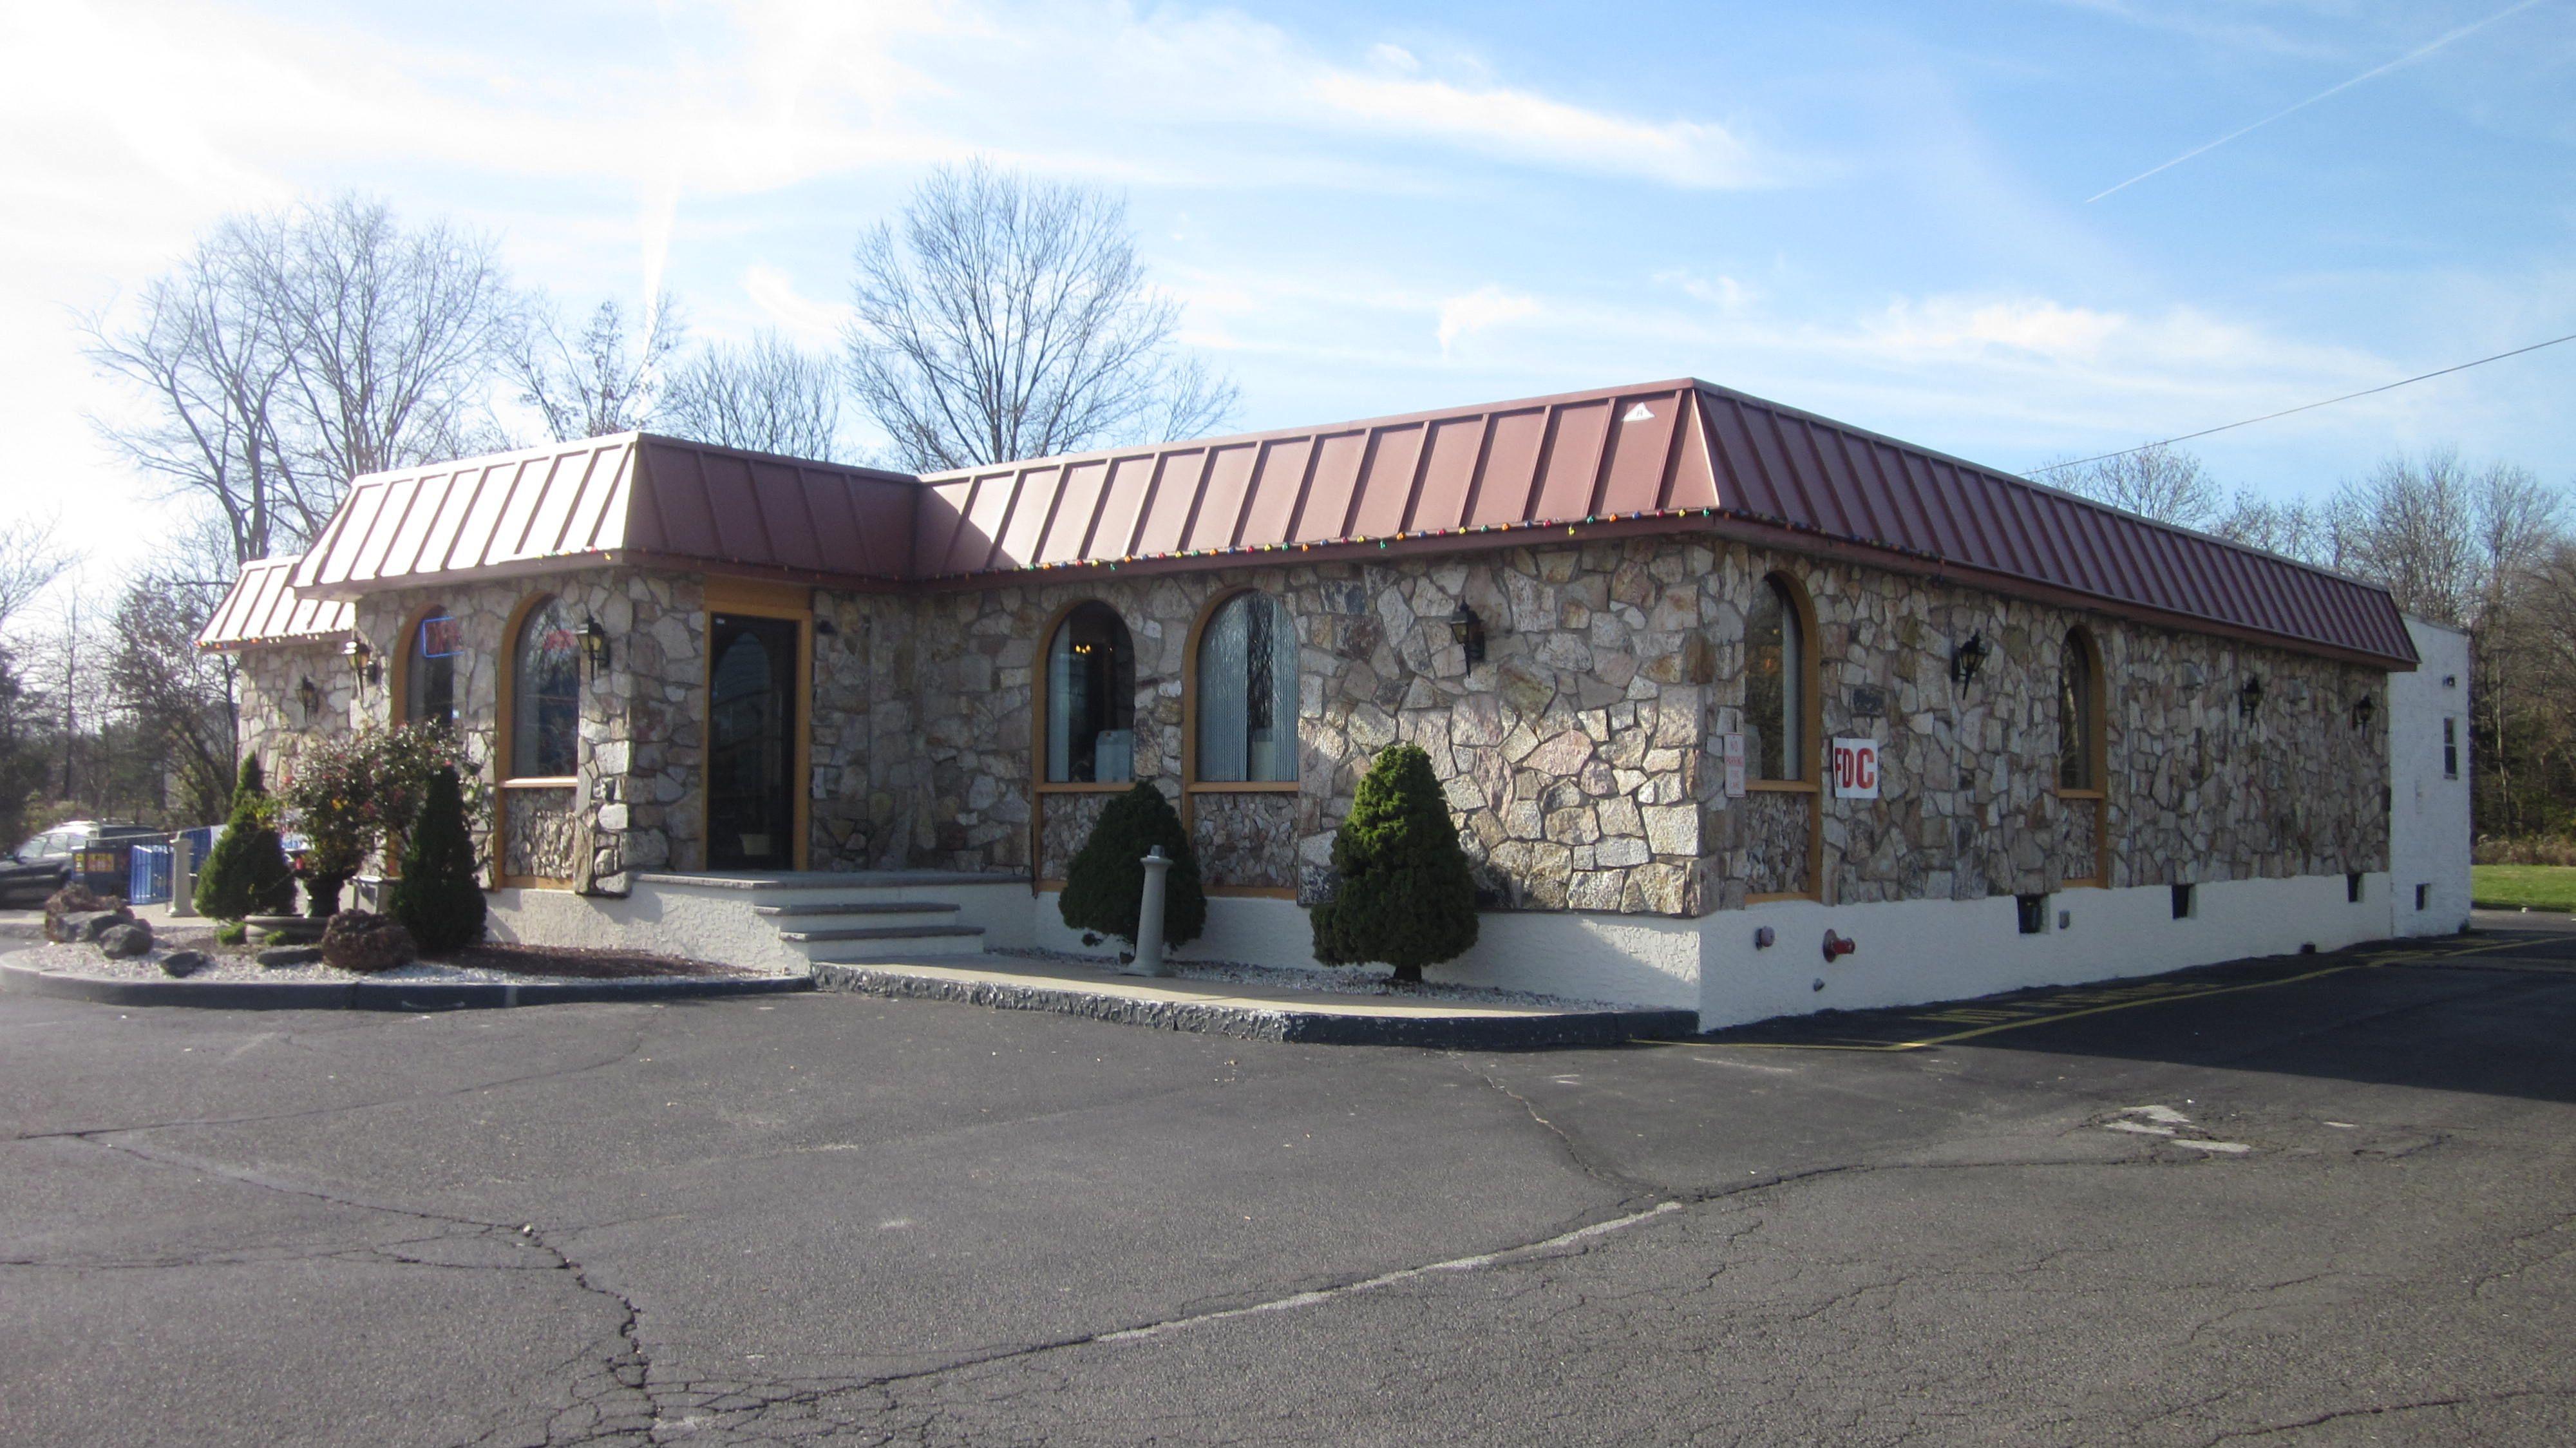 Toms River Cadillac star diner hillsborough nj | My New Jersey | Pinterest